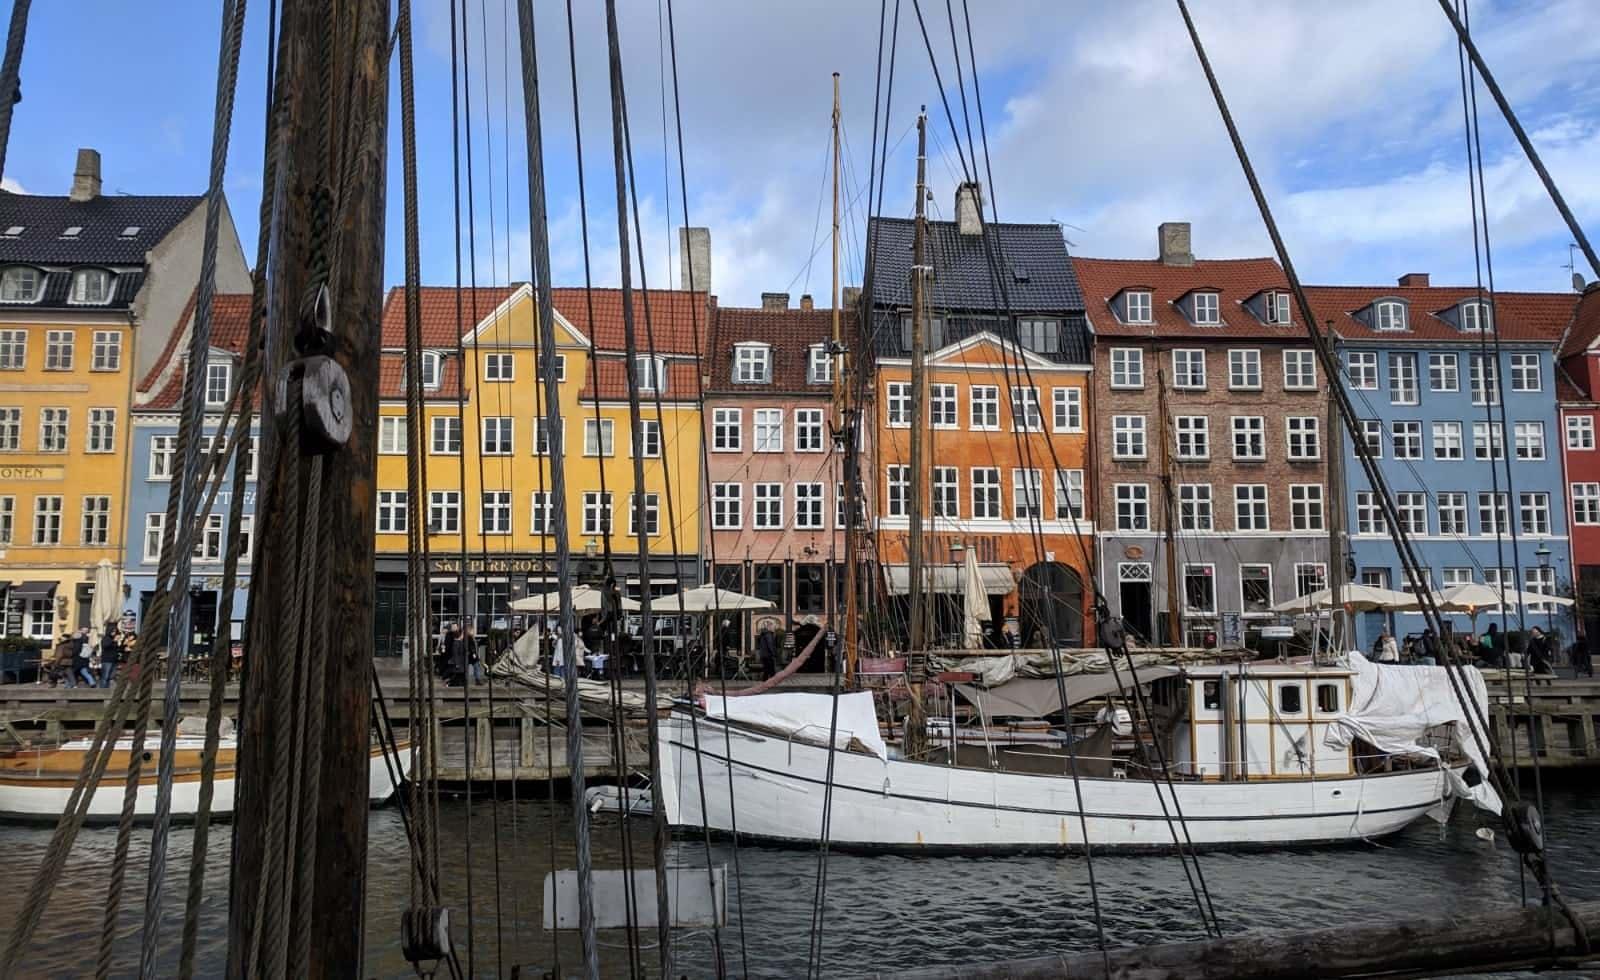 Magical Copenhagen: Little Mermaid image